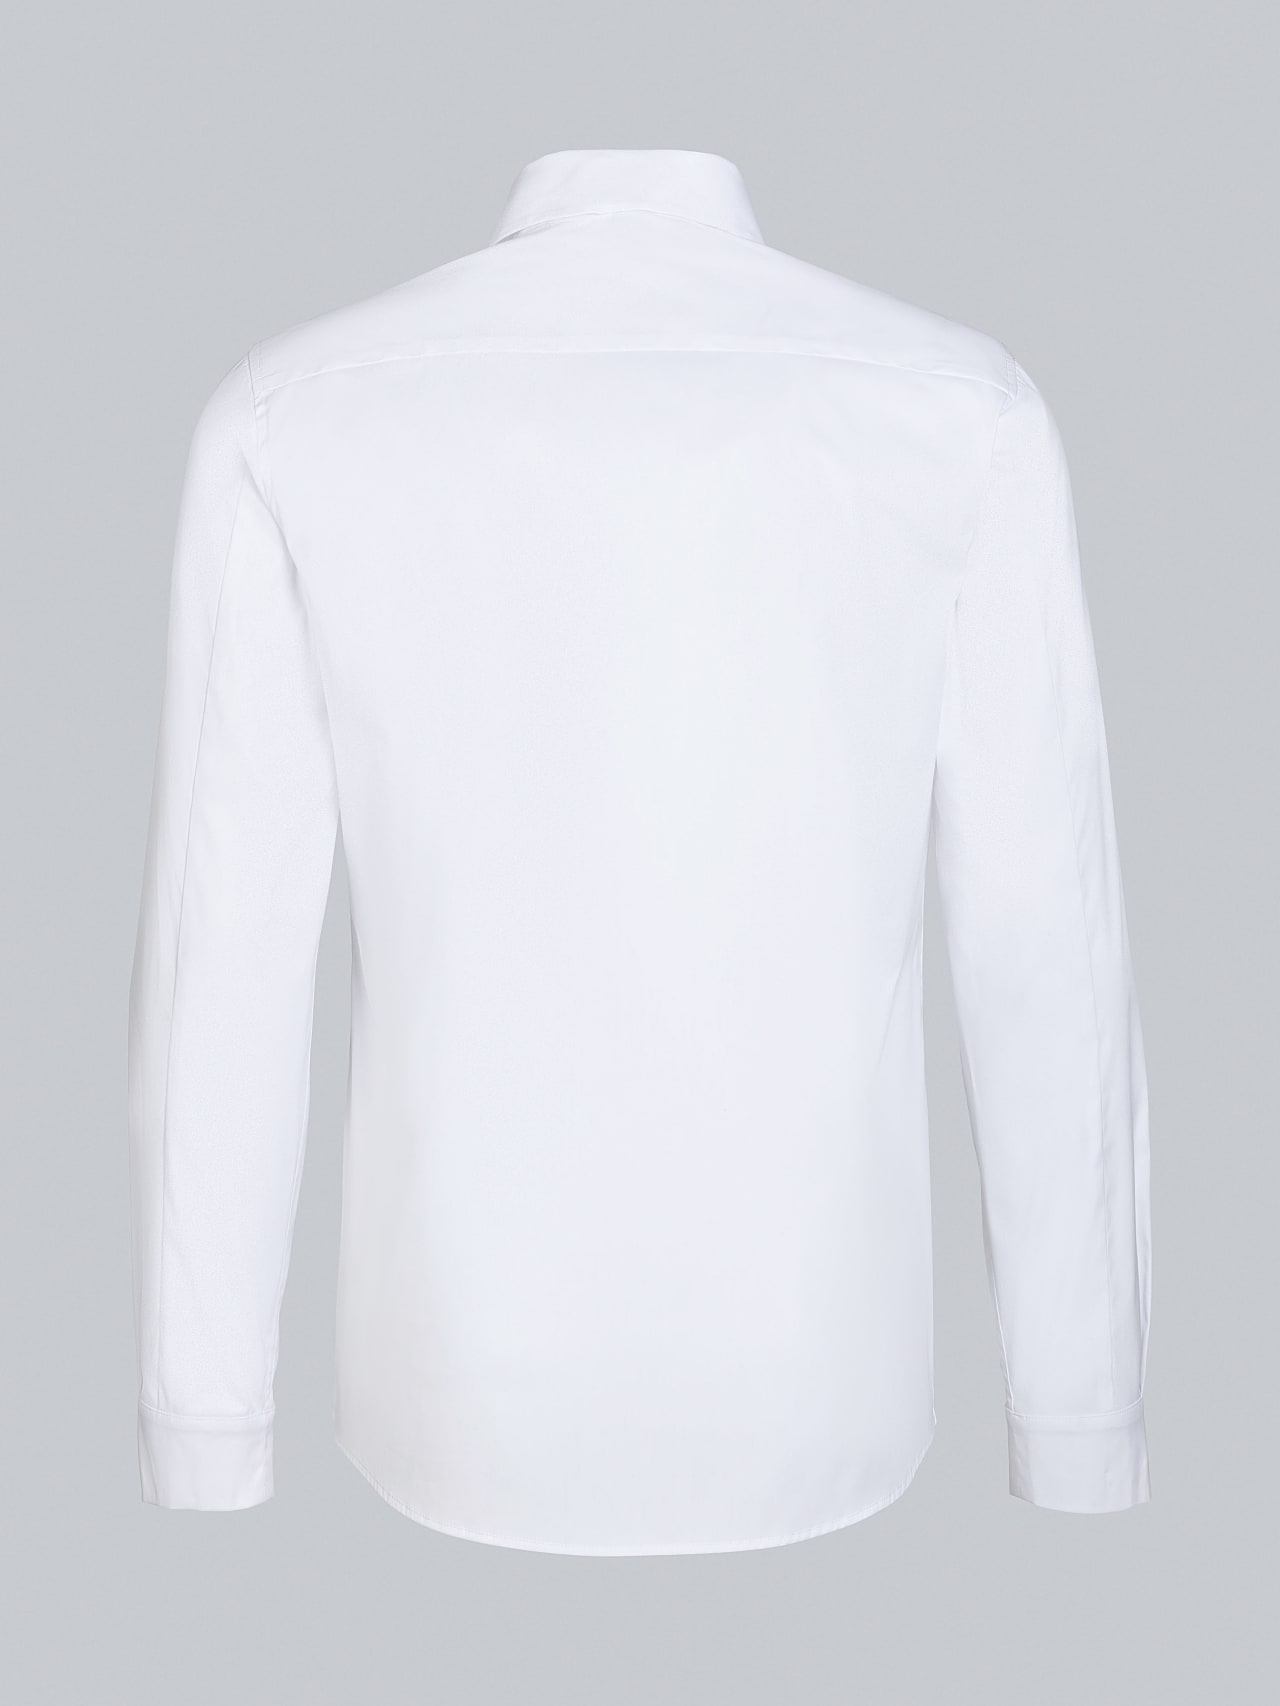 WAMNE V1.Y5.02 Easy-Care Shirt white Left Alpha Tauri